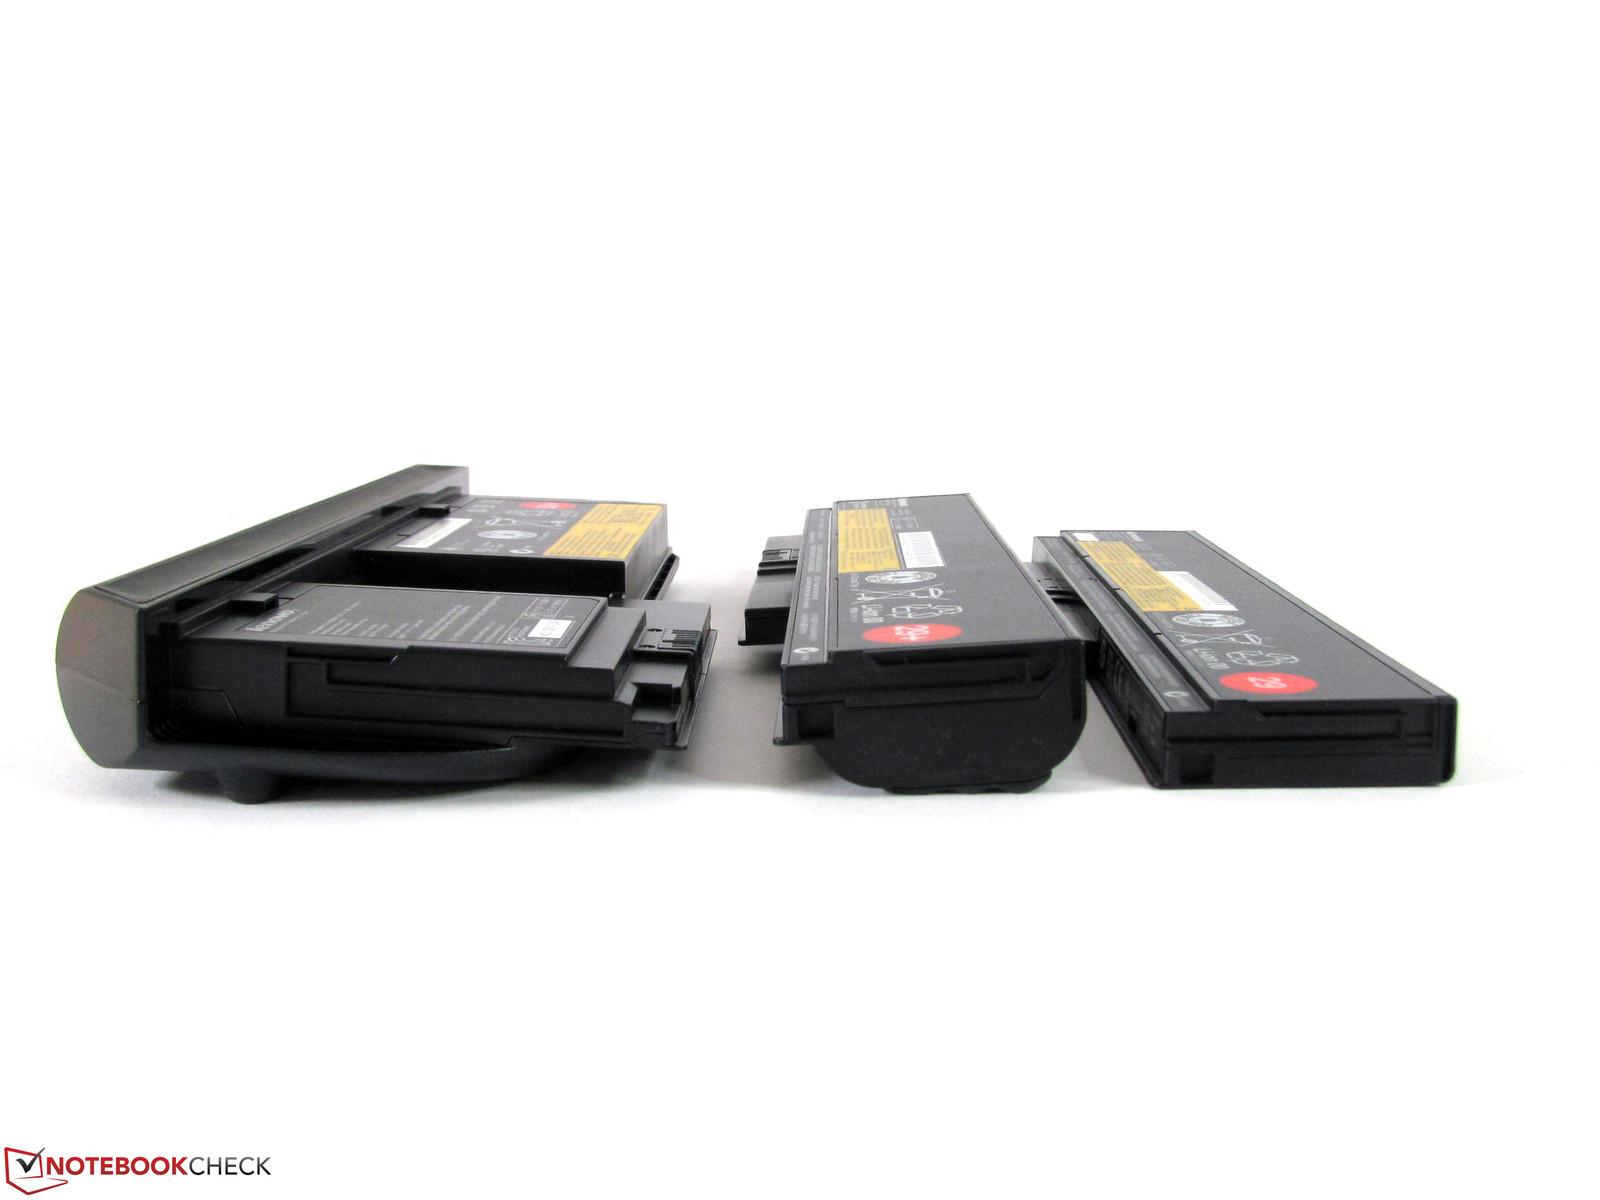 Recenzja Lenovo ThinkPad X220T - Notebookcheck pl